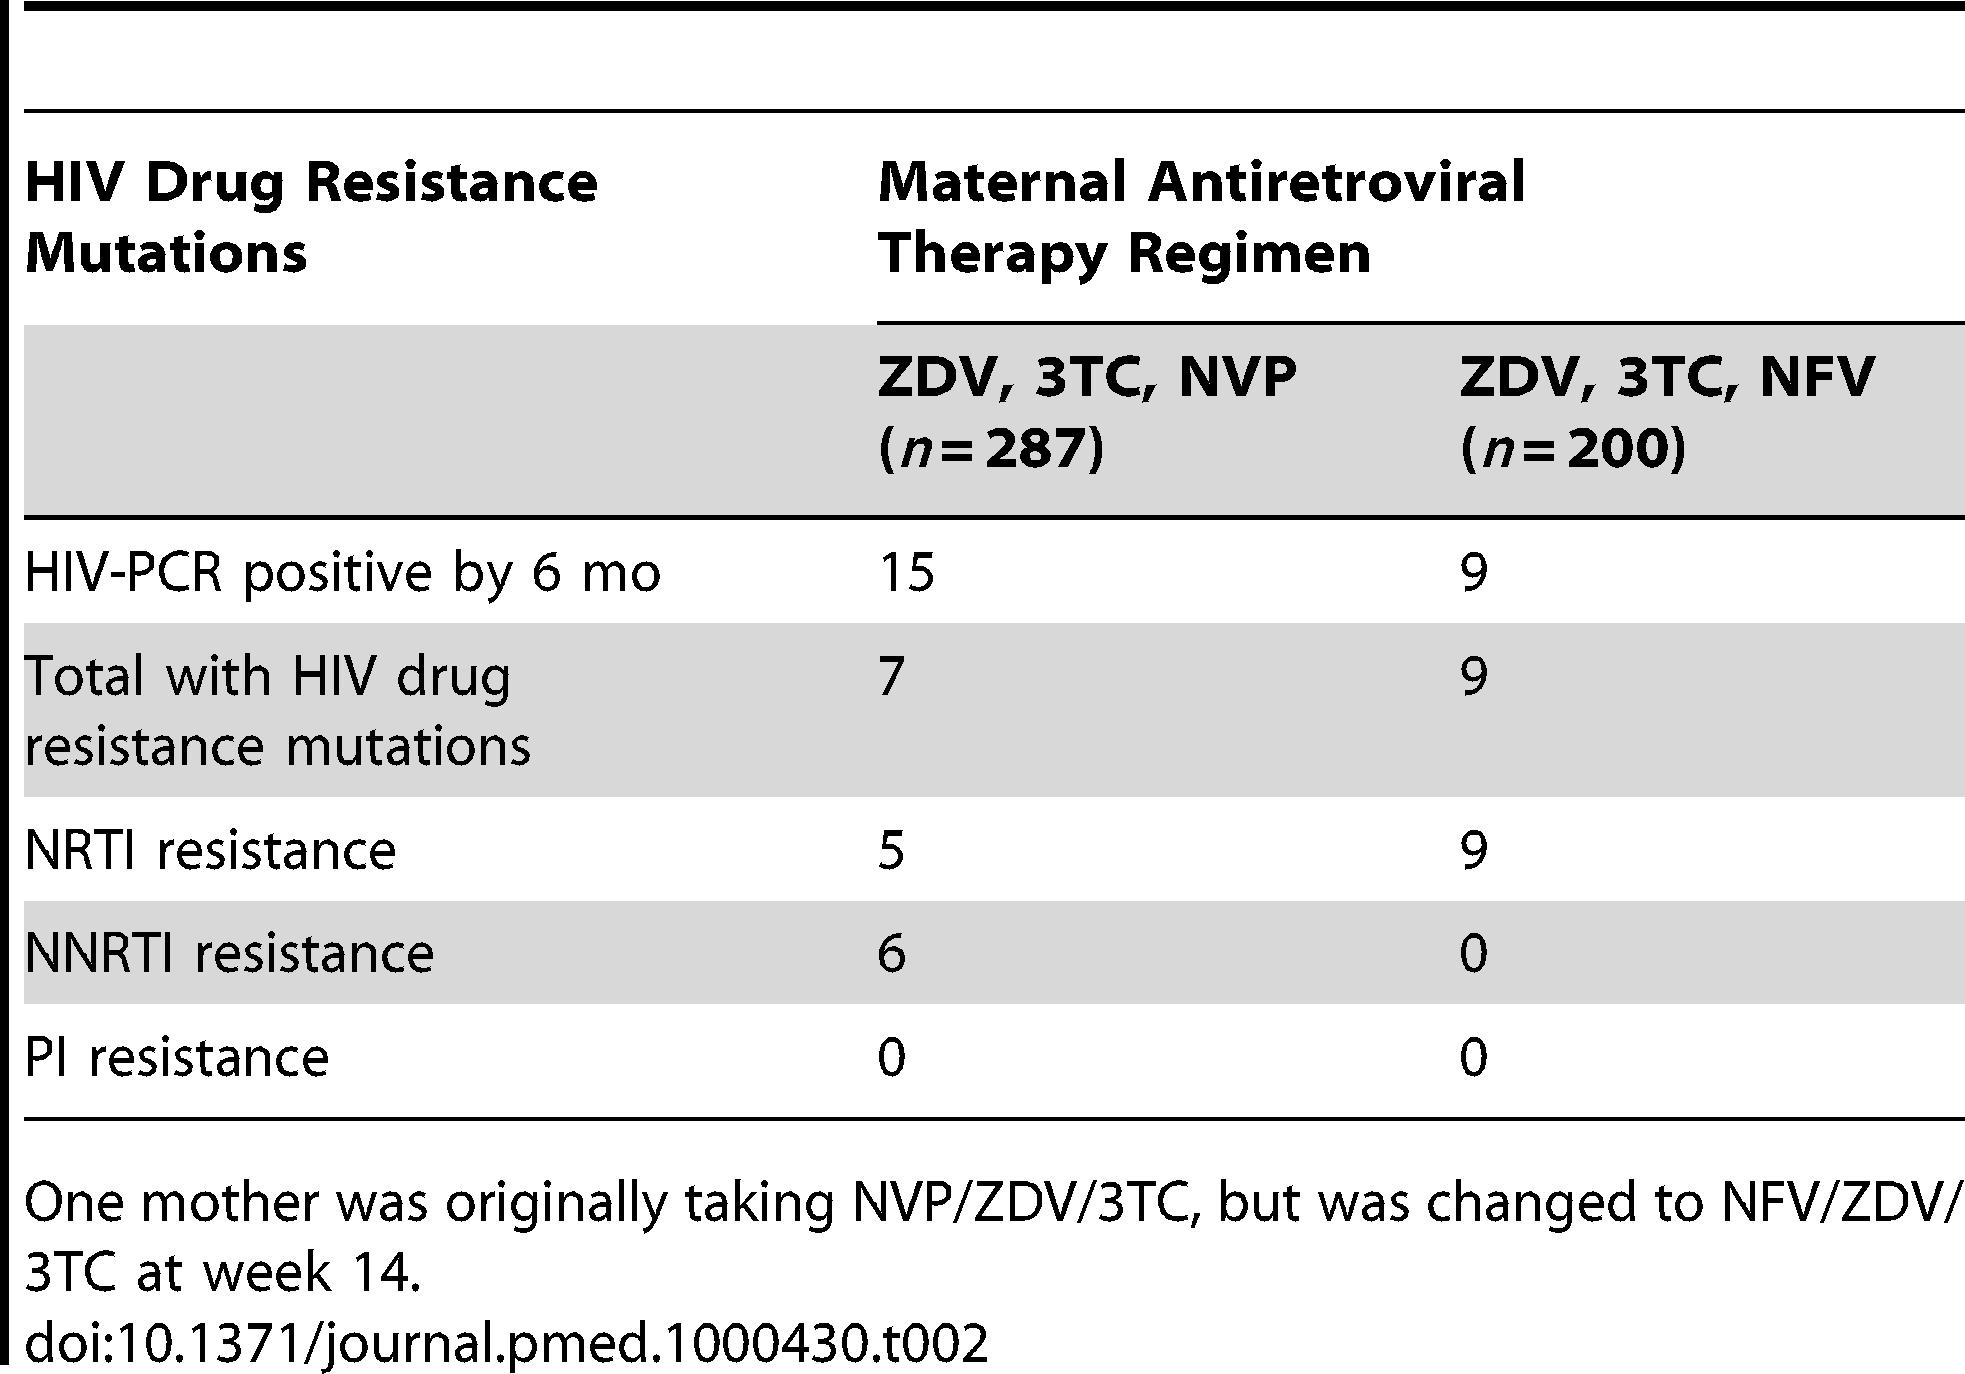 HIV drug resistance mutations among breastfeeding infants at 6 mo post partum according to maternal regimen.